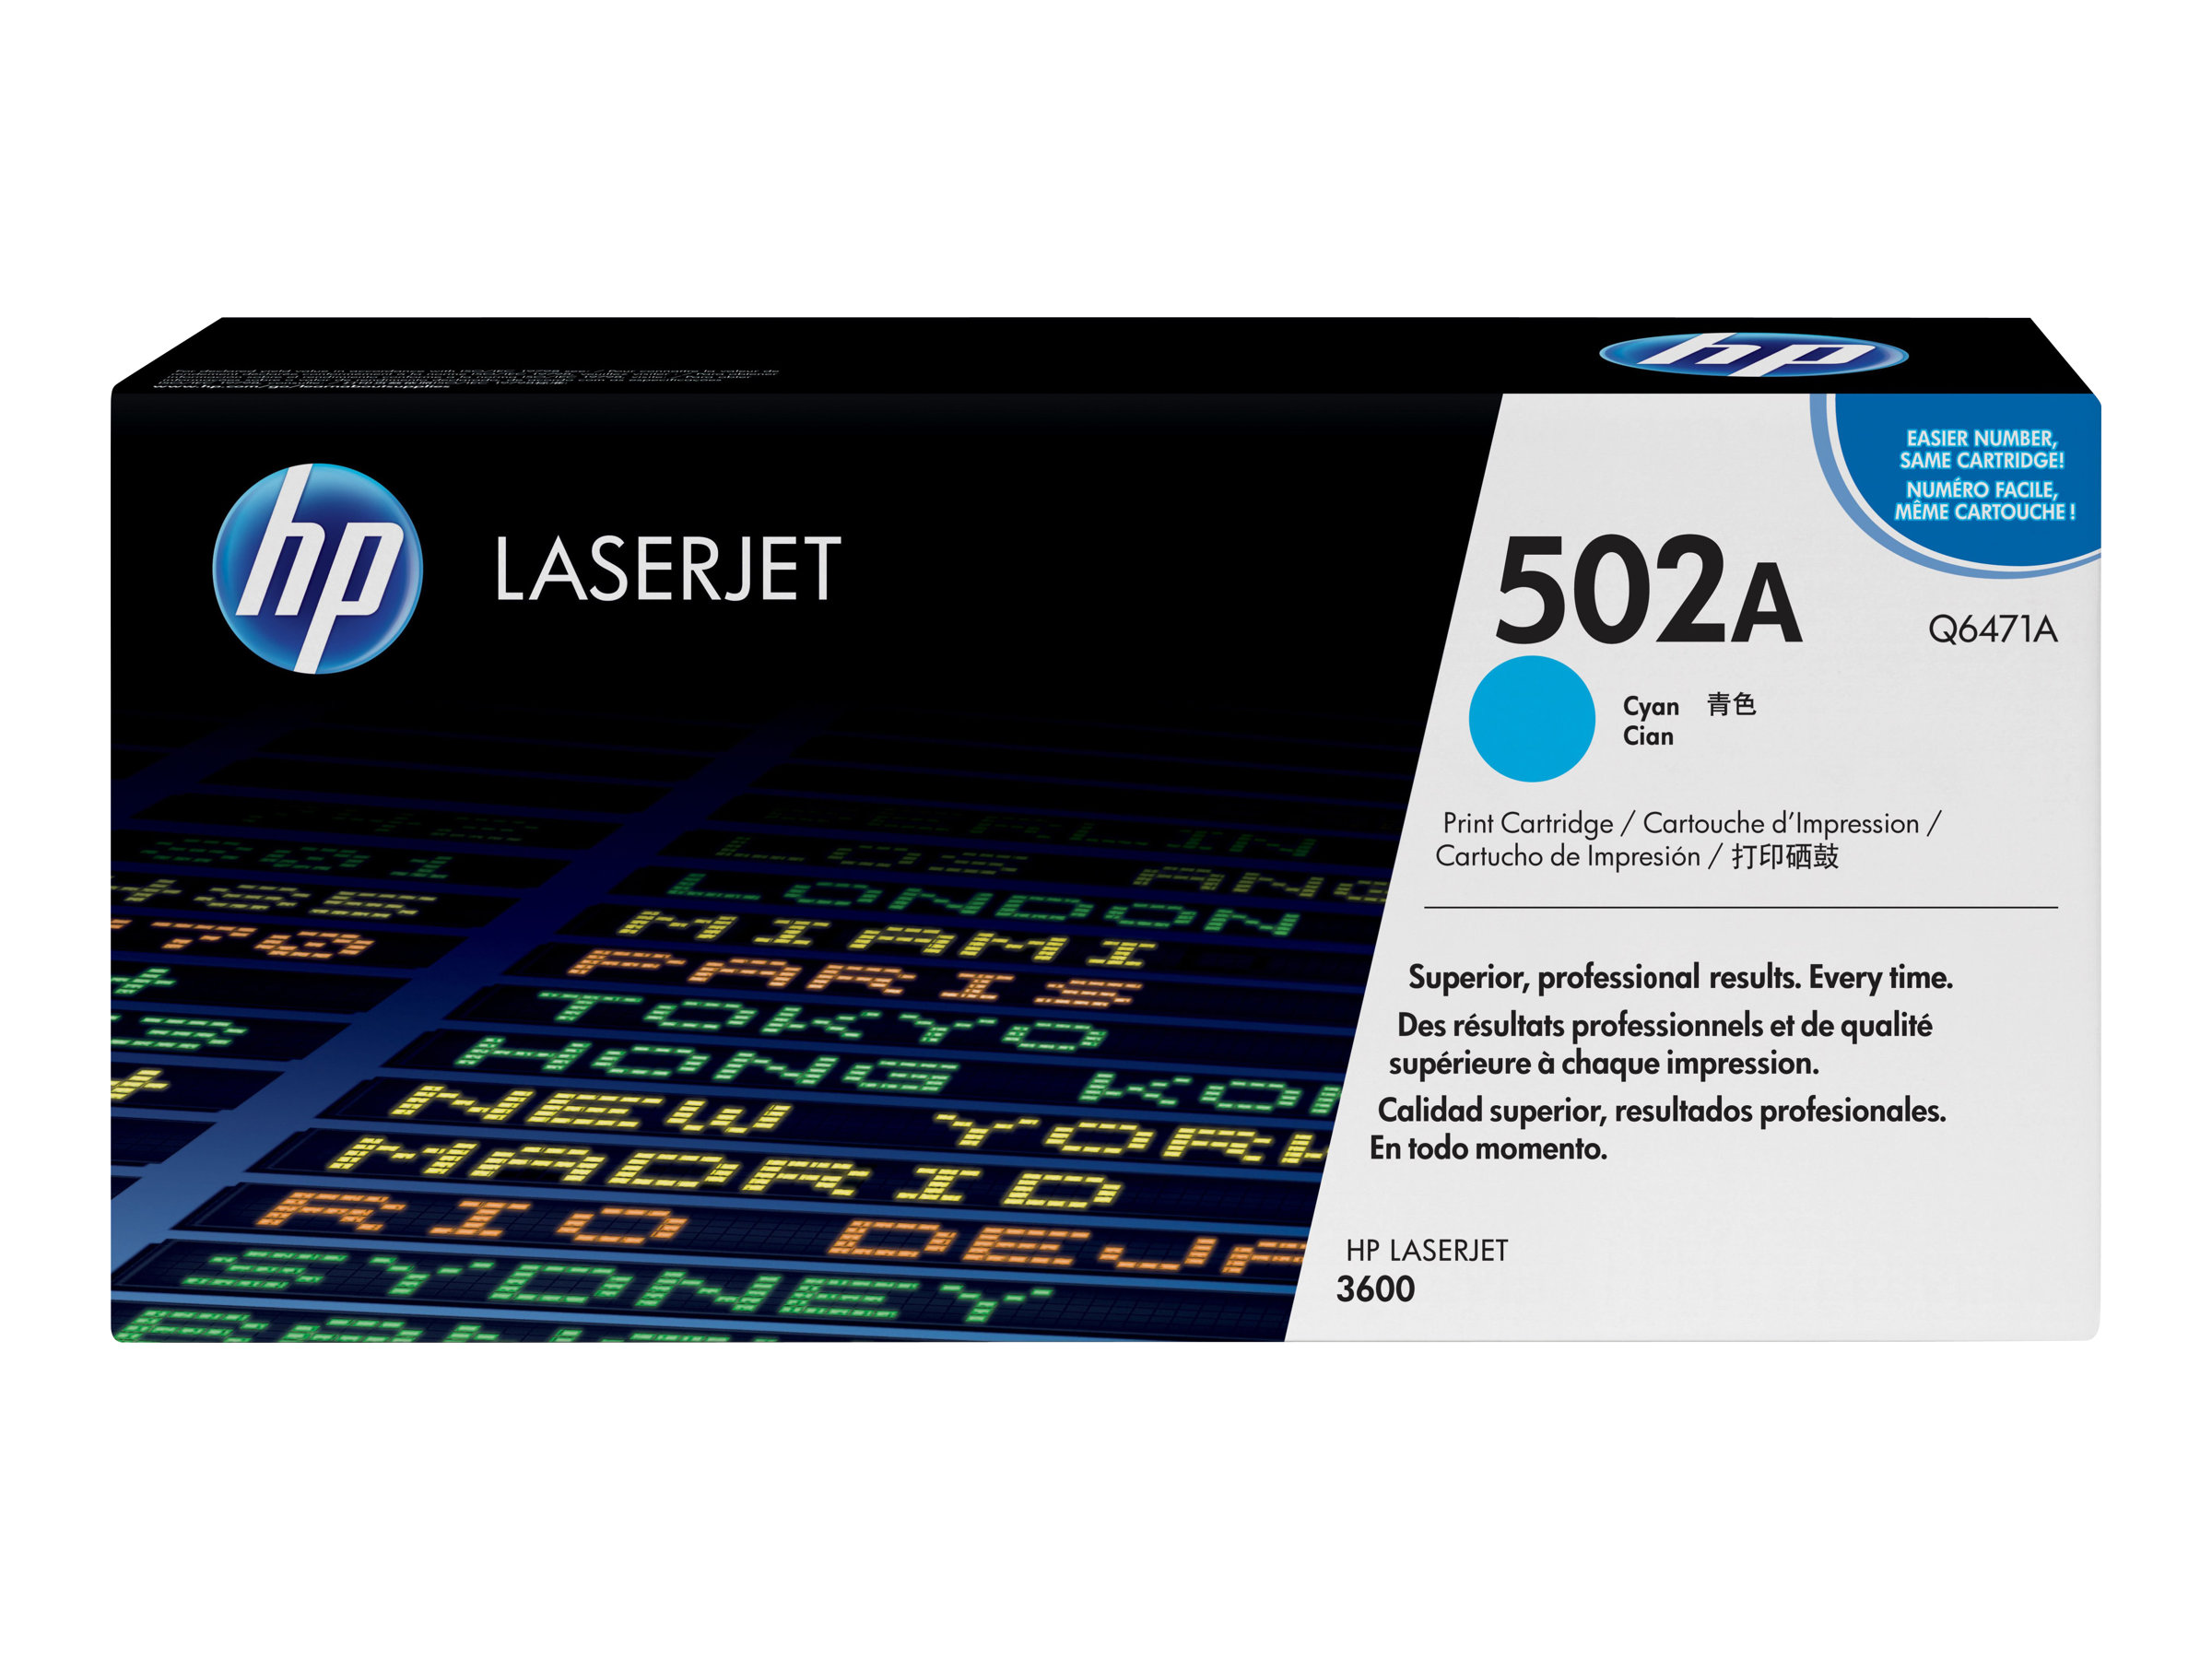 HP 502A - Cyan - Original - LaserJet - Tonerpatrone (Q6471A) - für Color LaserJet 3600, 3600dn, 3600n